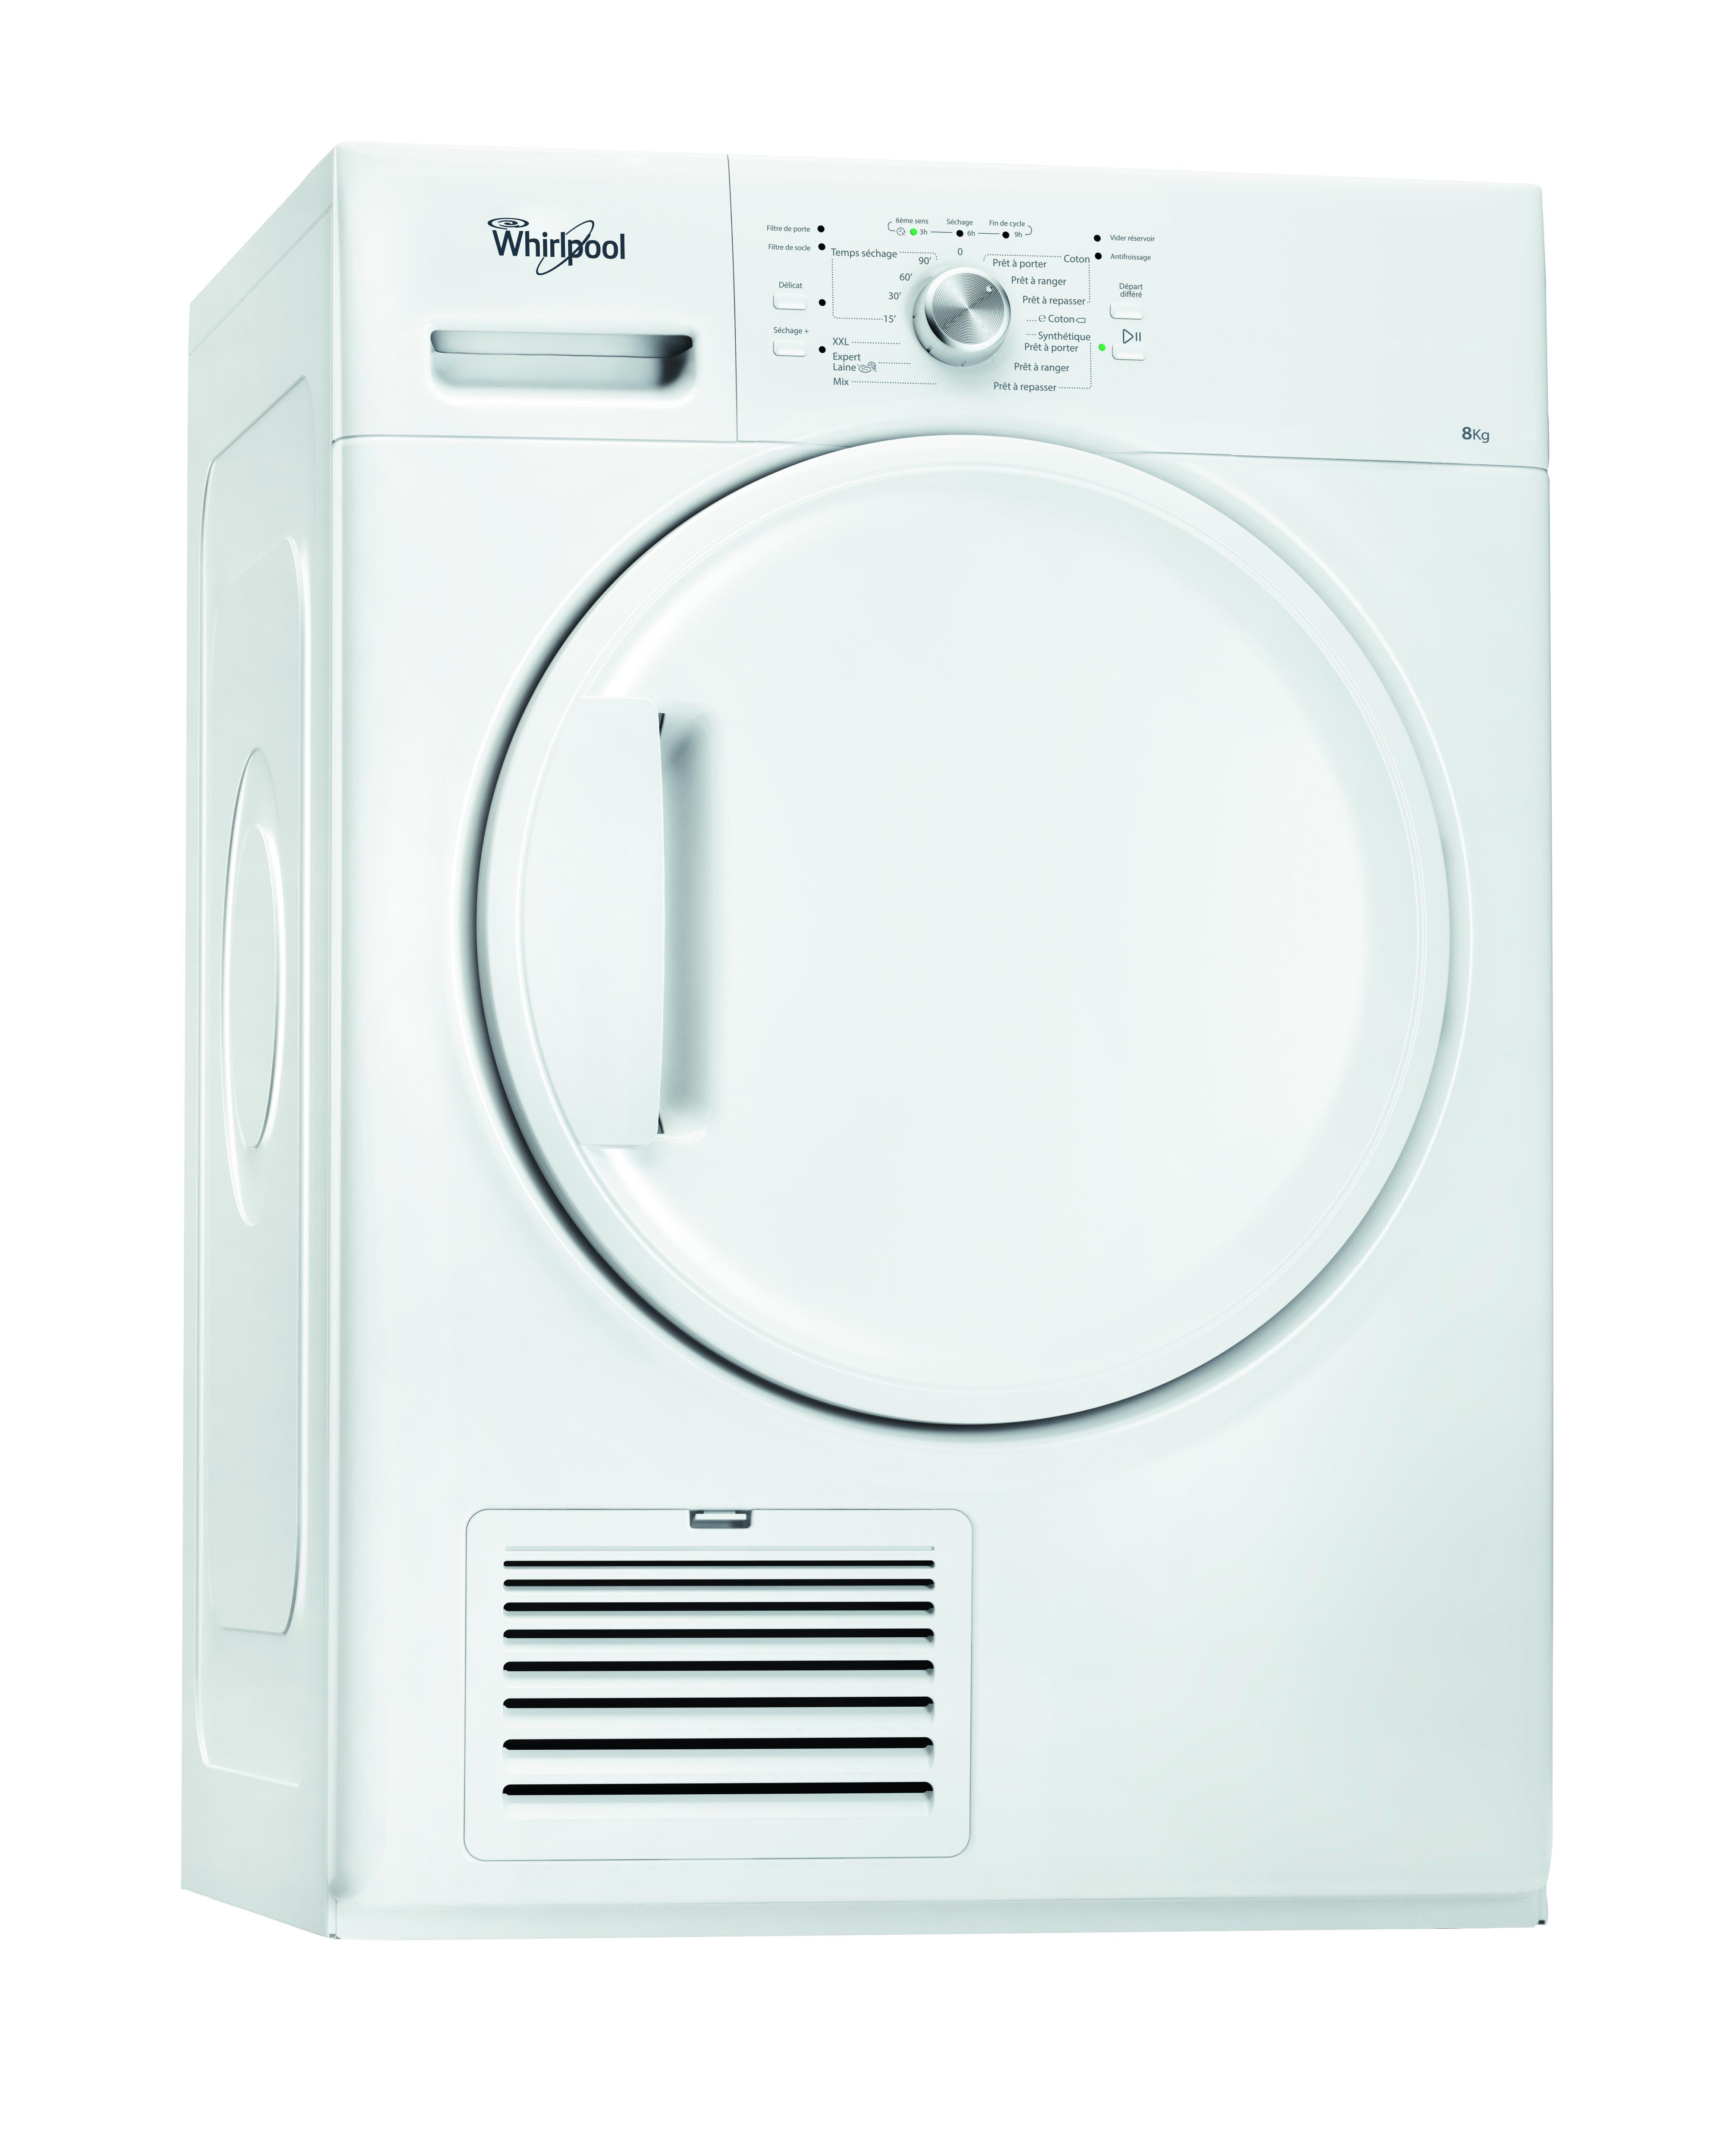 sèche-linge whirlpool - achat sèche-linge whirlpool pas cher - rue